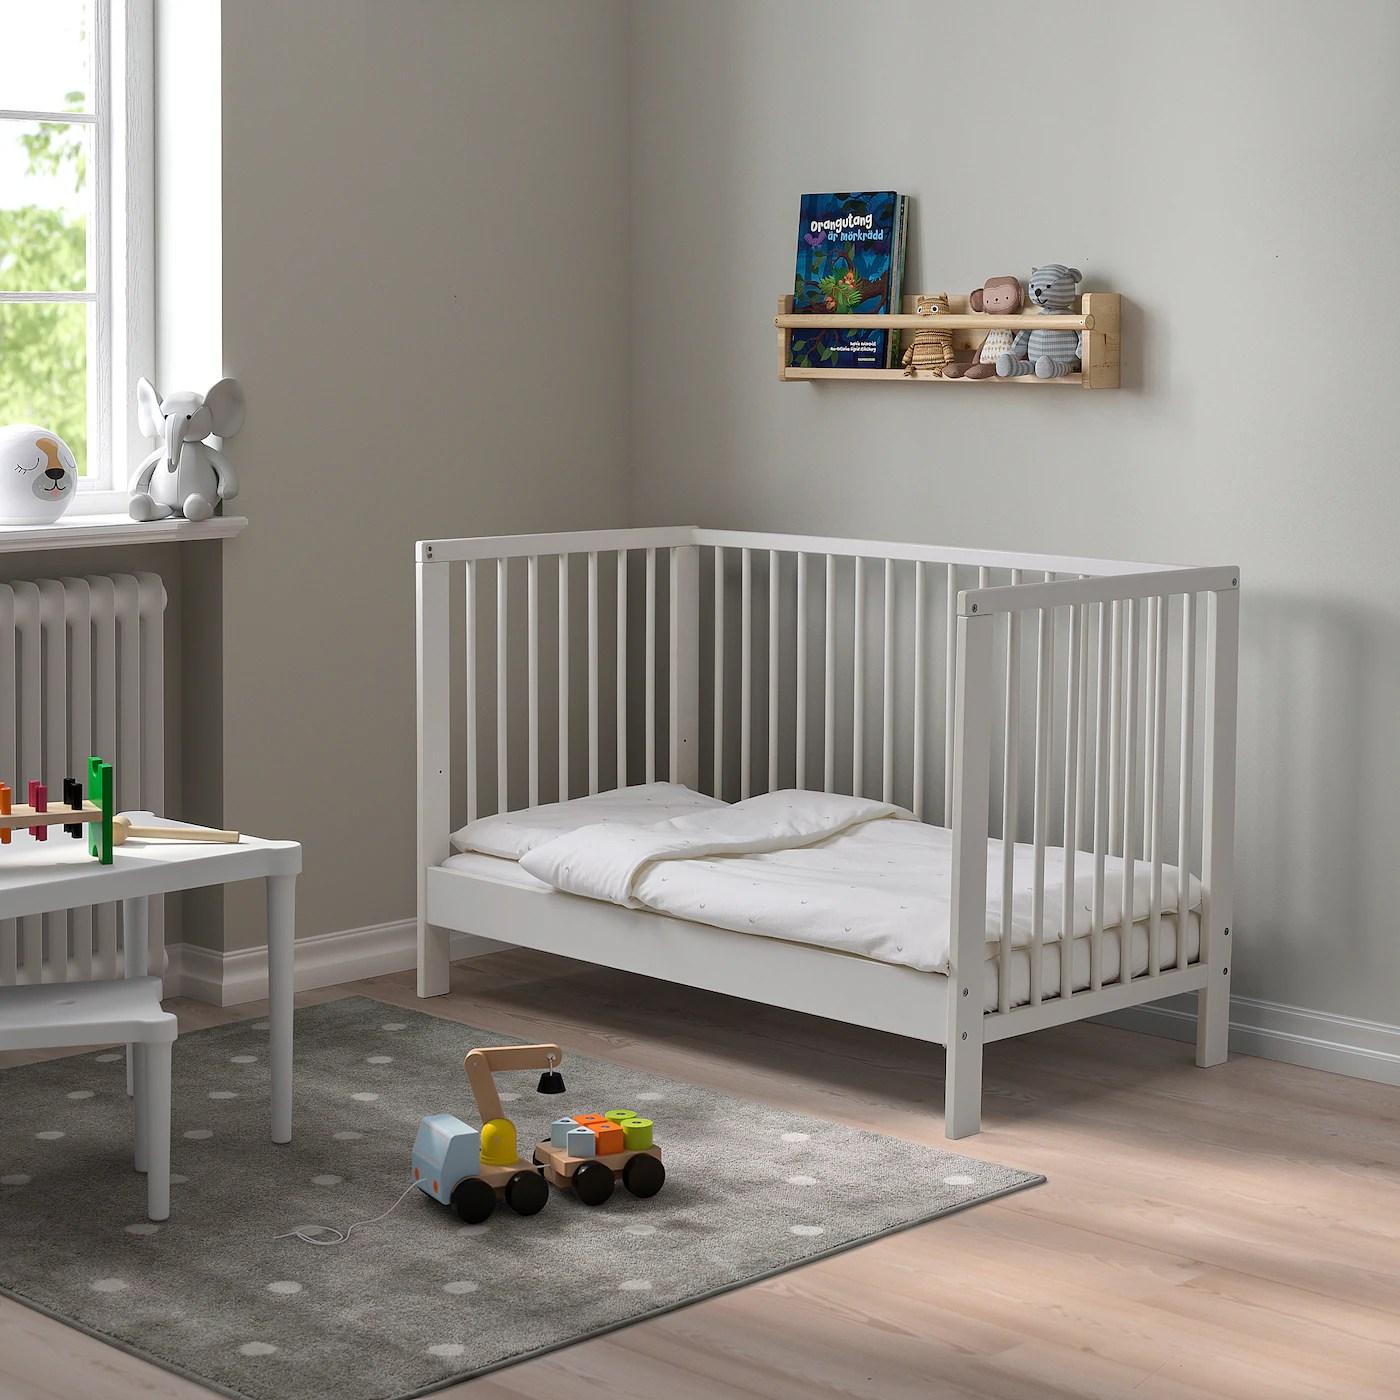 Gulliver Lit Bebe Blanc 60x120 Cm Materiau Durable Ikea